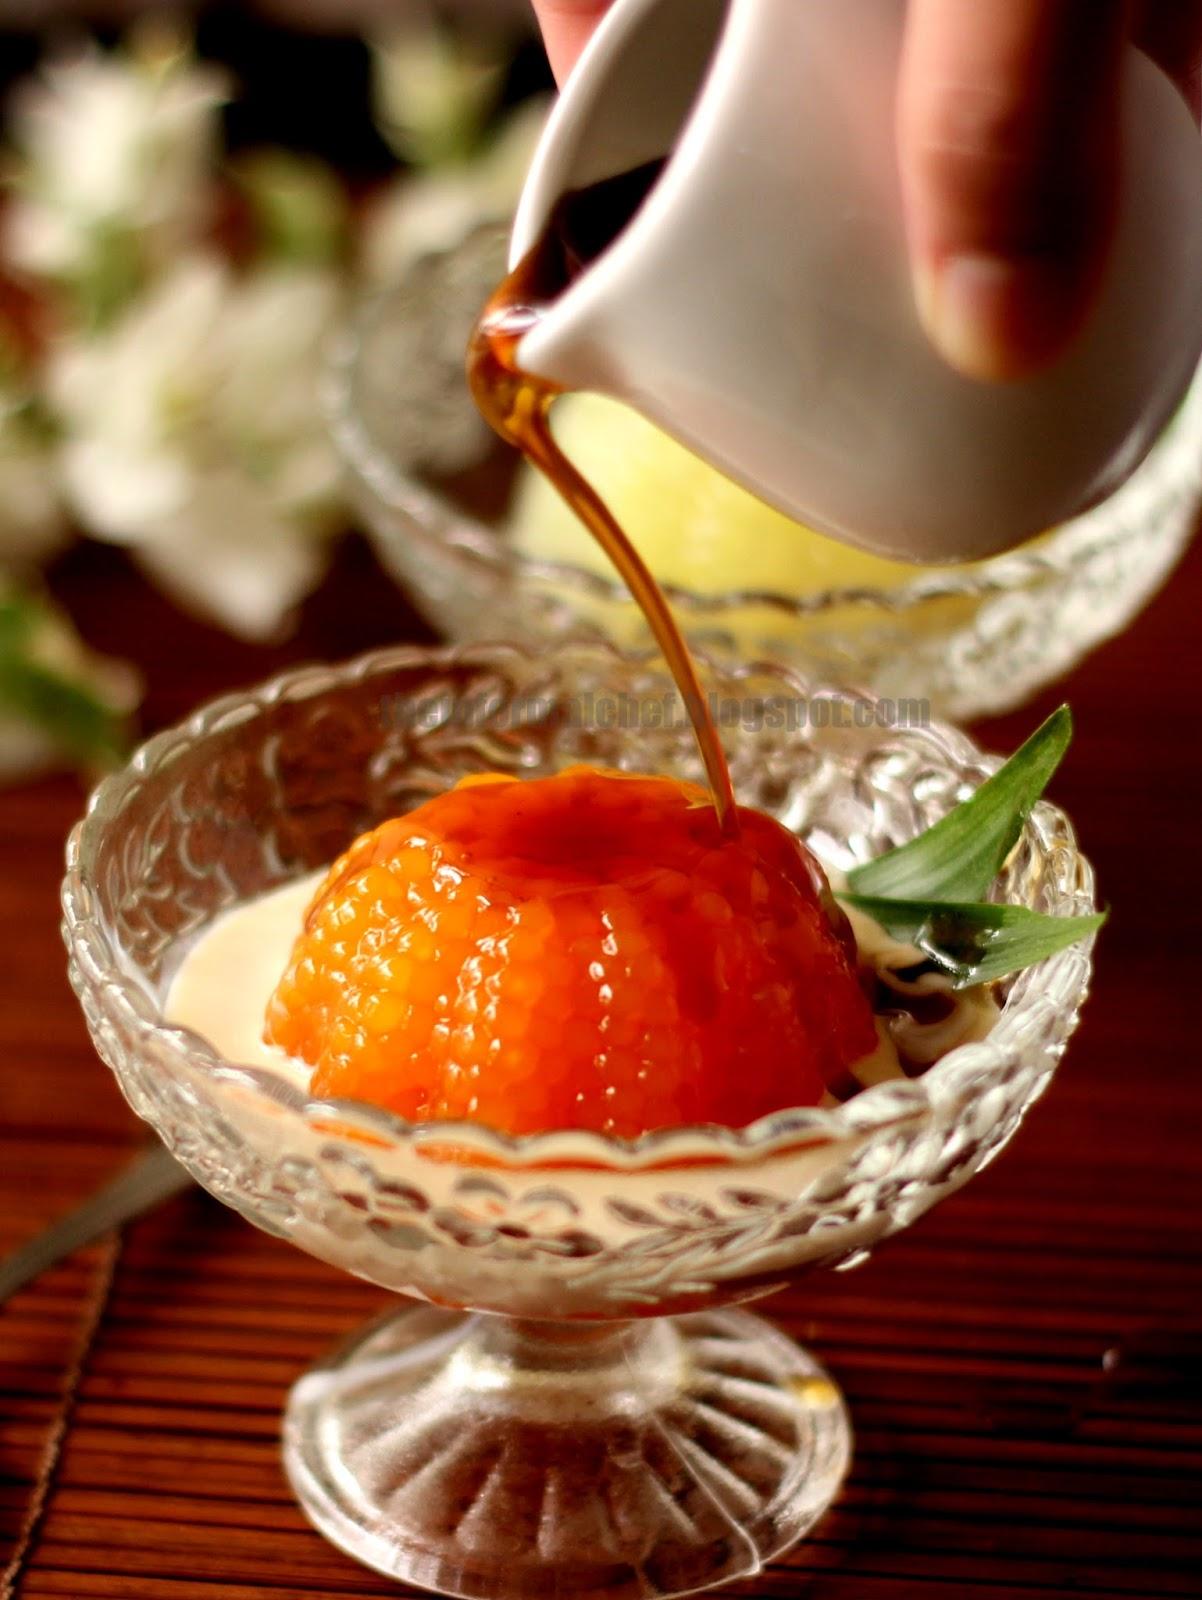 The Informal Chef: Palm Sugar Sago Pudding/Puding Sagu Gula Melaka 沙谷米椰糖布丁